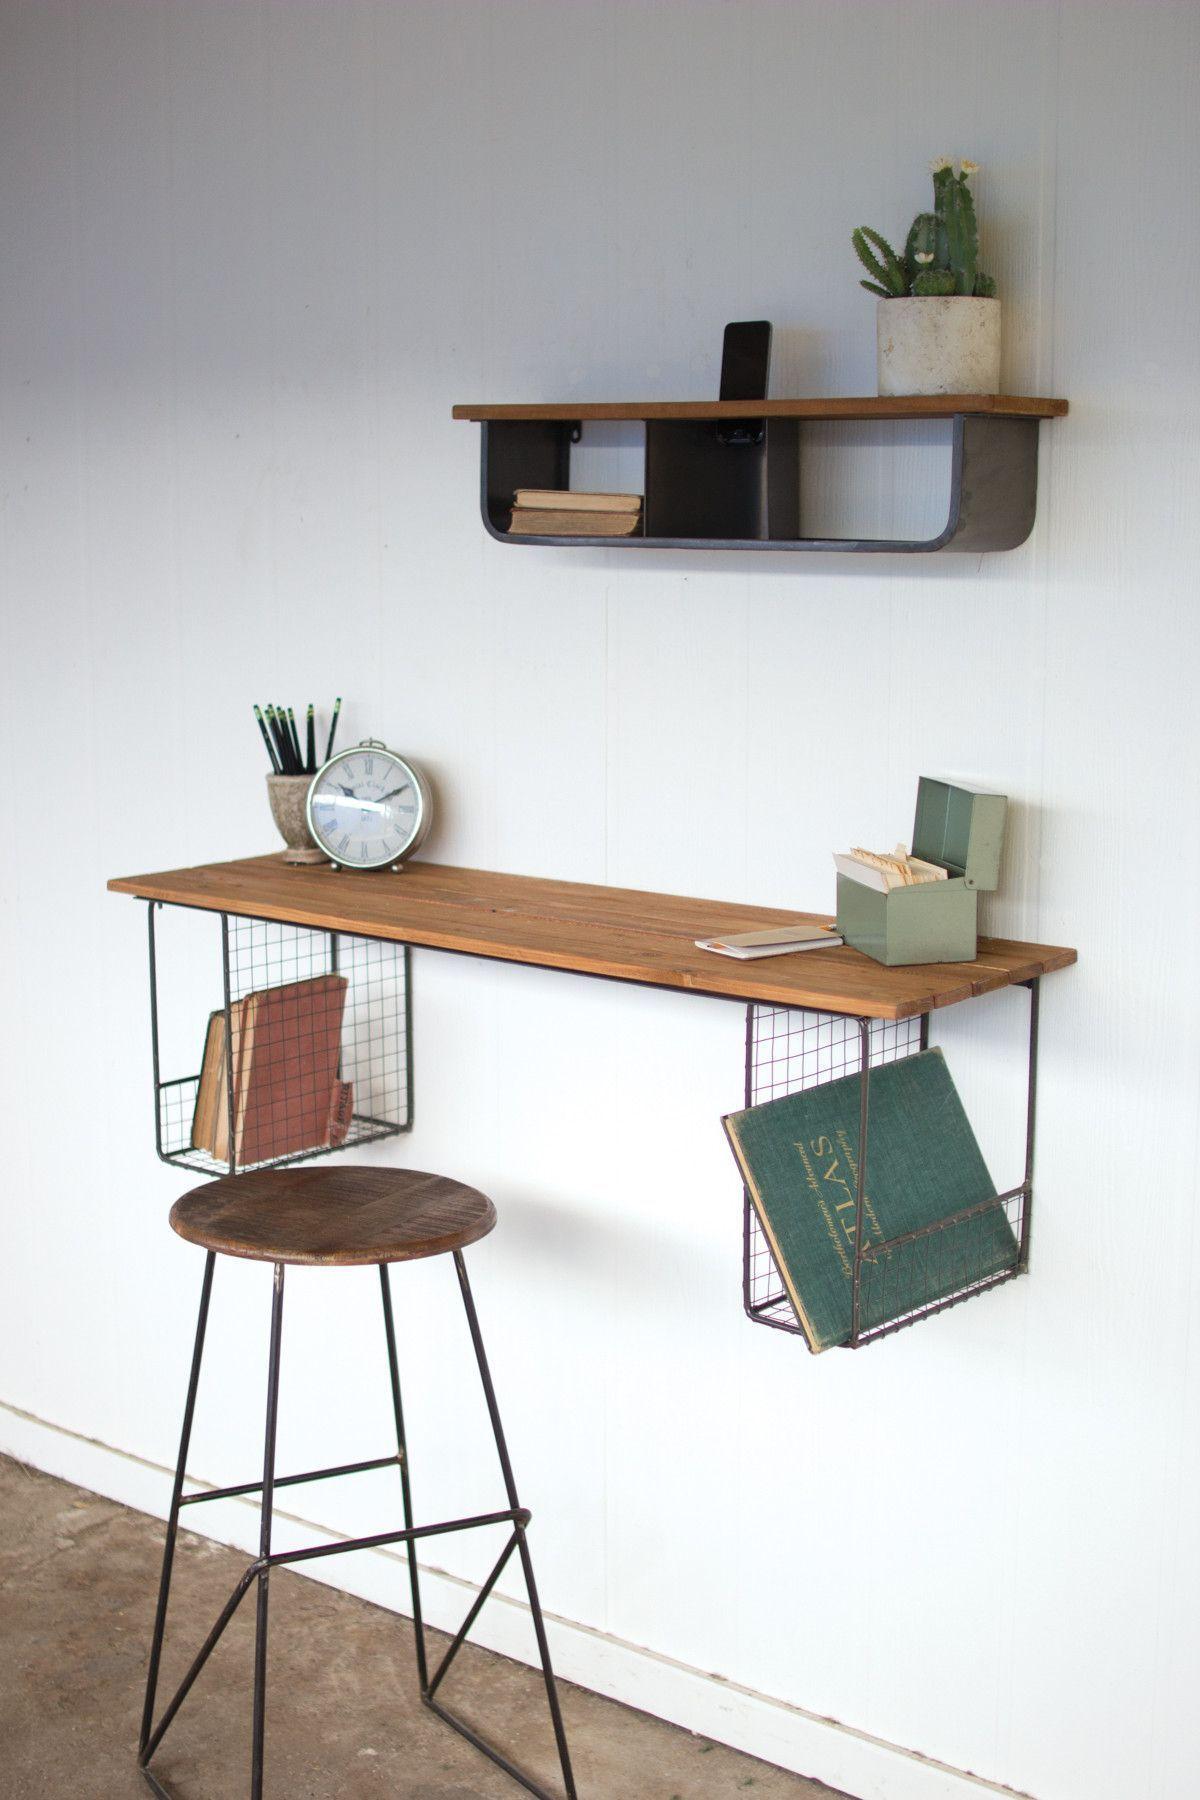 Kalalou Honey Wood Wall Mount Desk Shelves With Wire Baskets